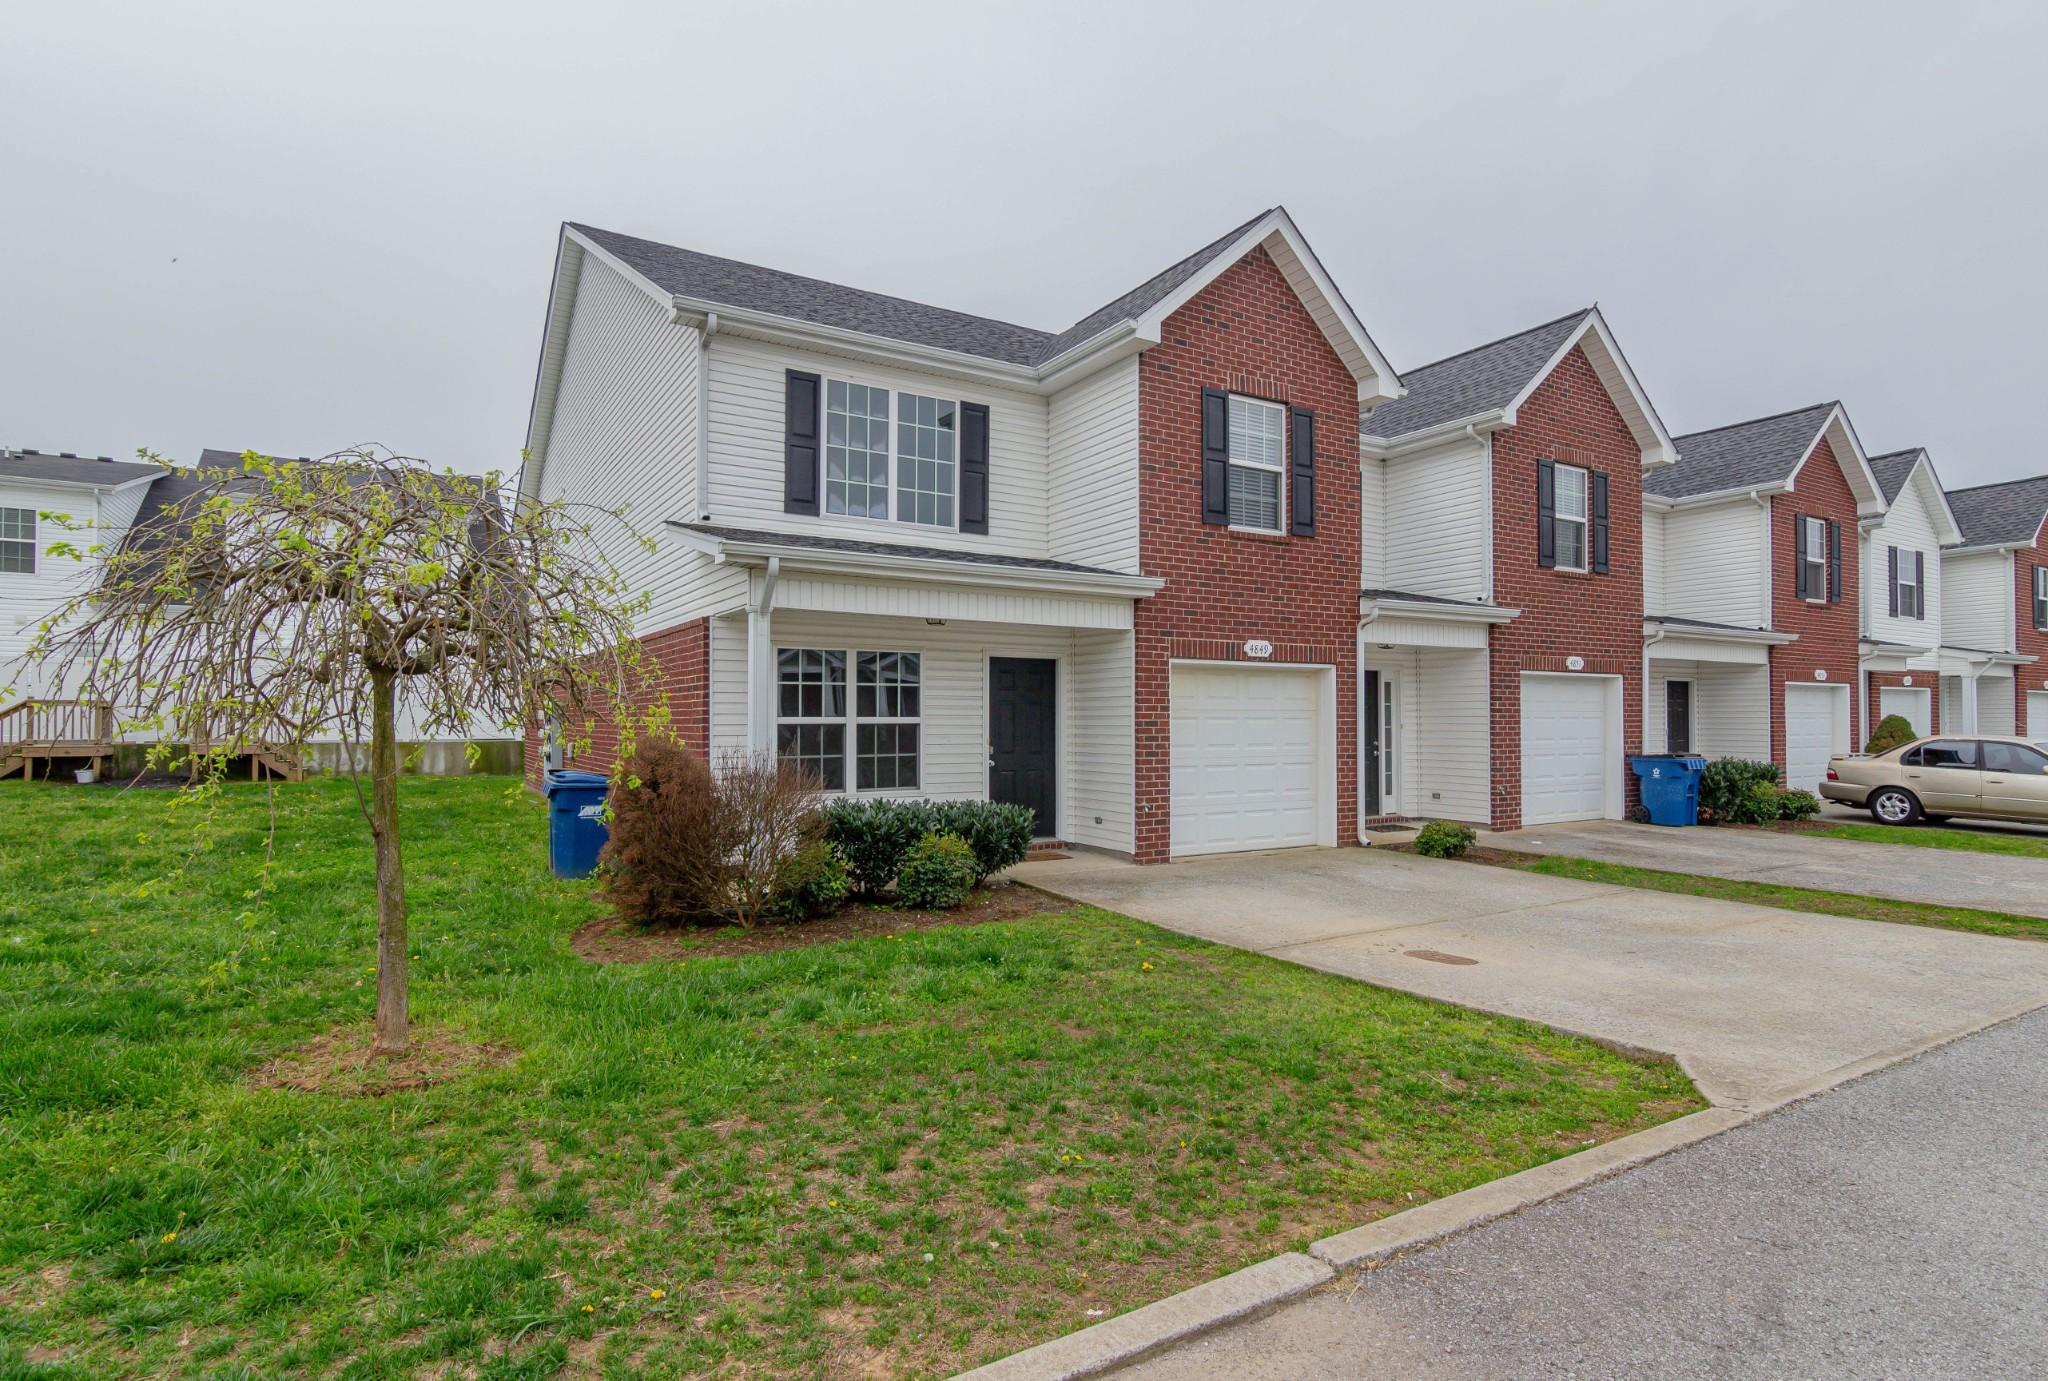 4849 Octavia St, Murfreesboro, TN 37129 - Murfreesboro, TN real estate listing